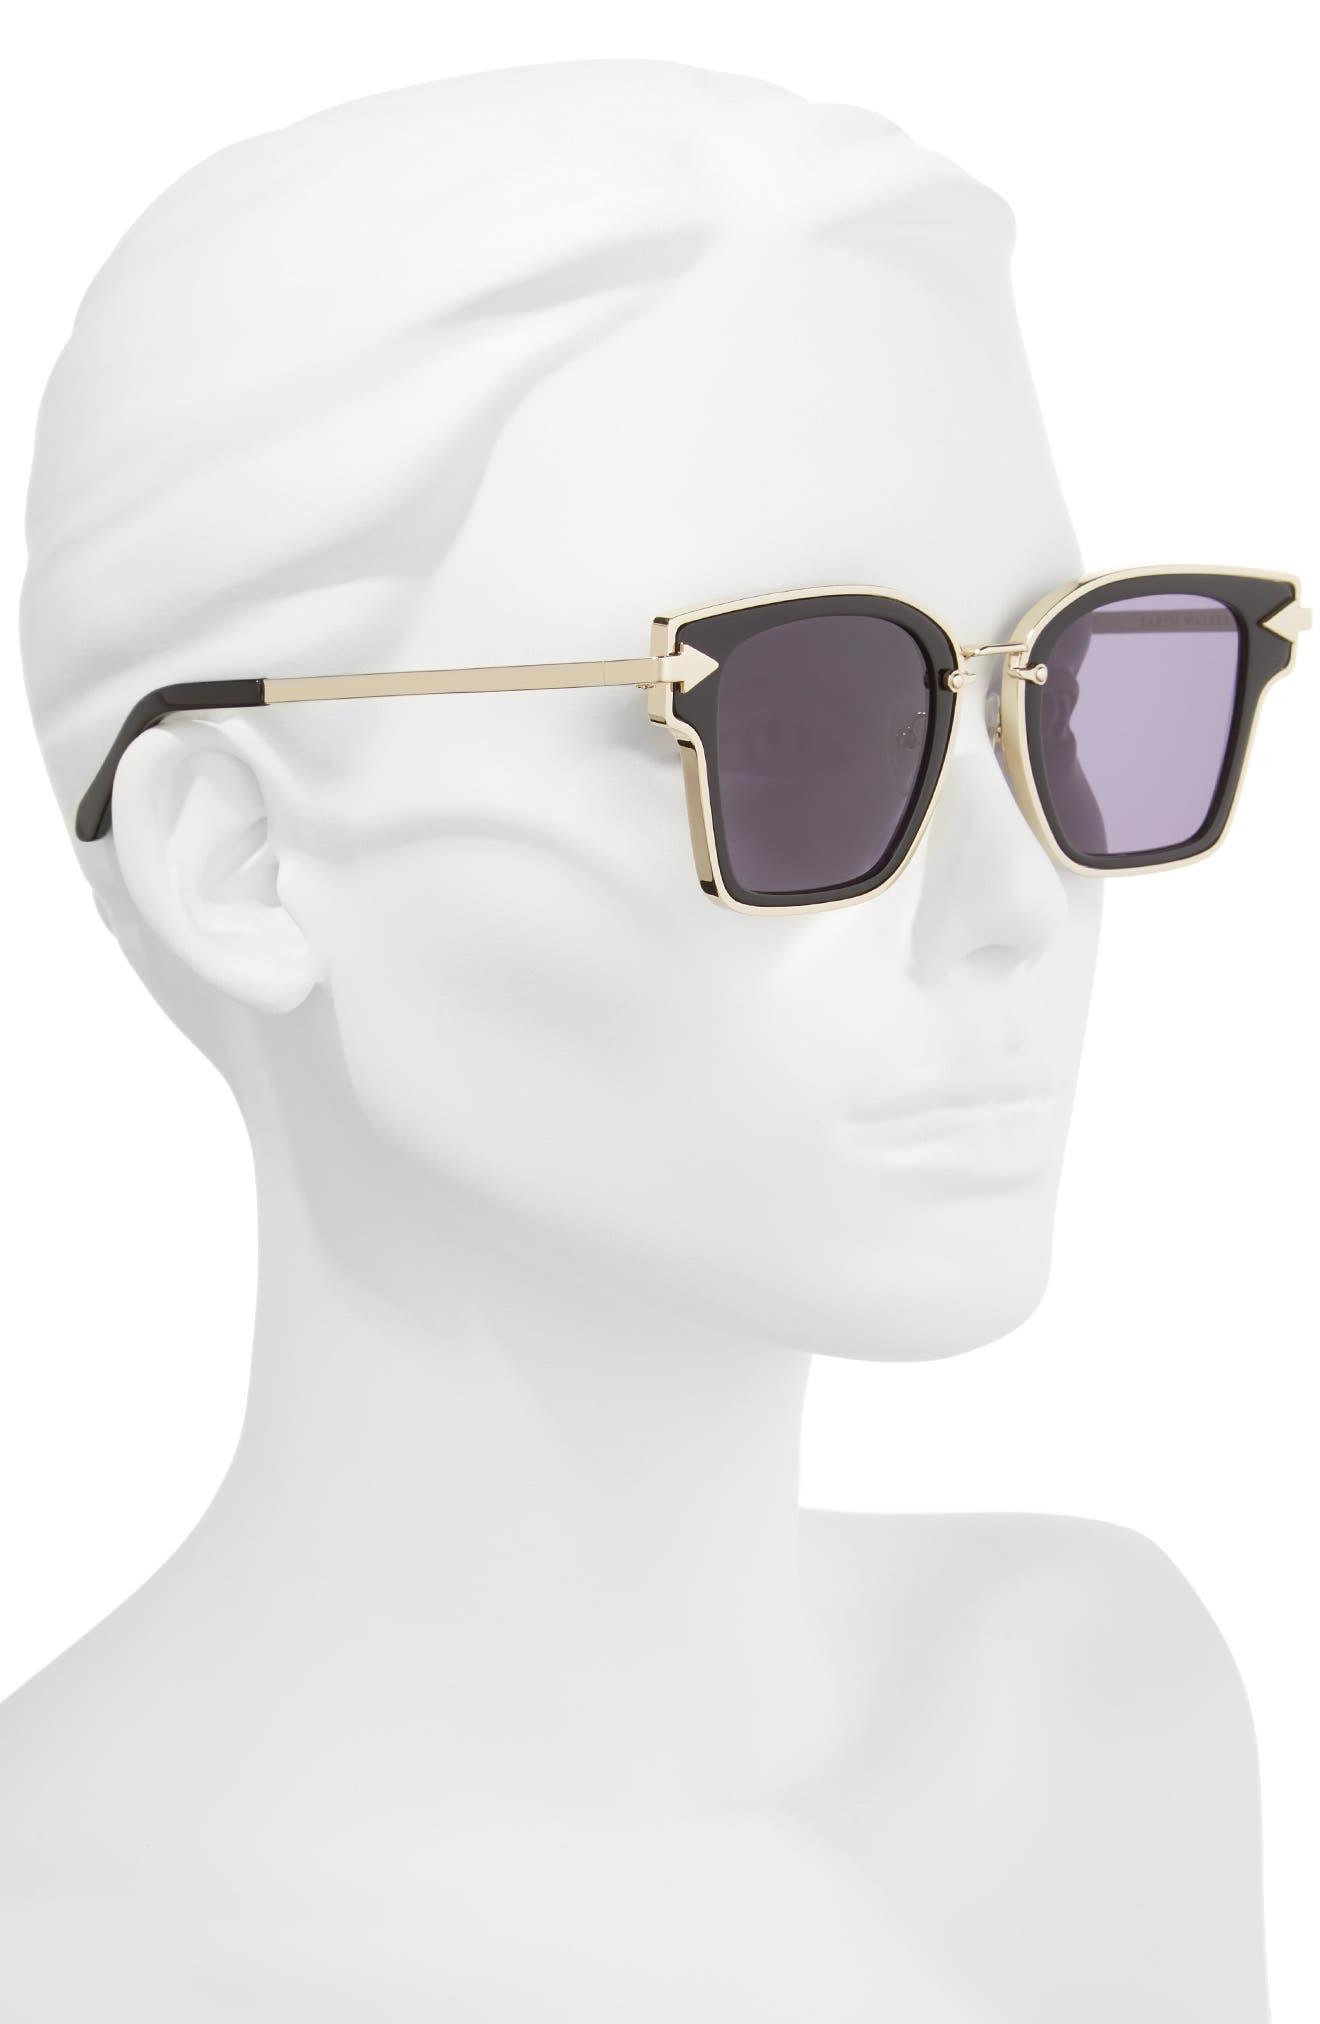 Rebellion 49mm Sunglasses,                             Alternate thumbnail 2, color,                             001